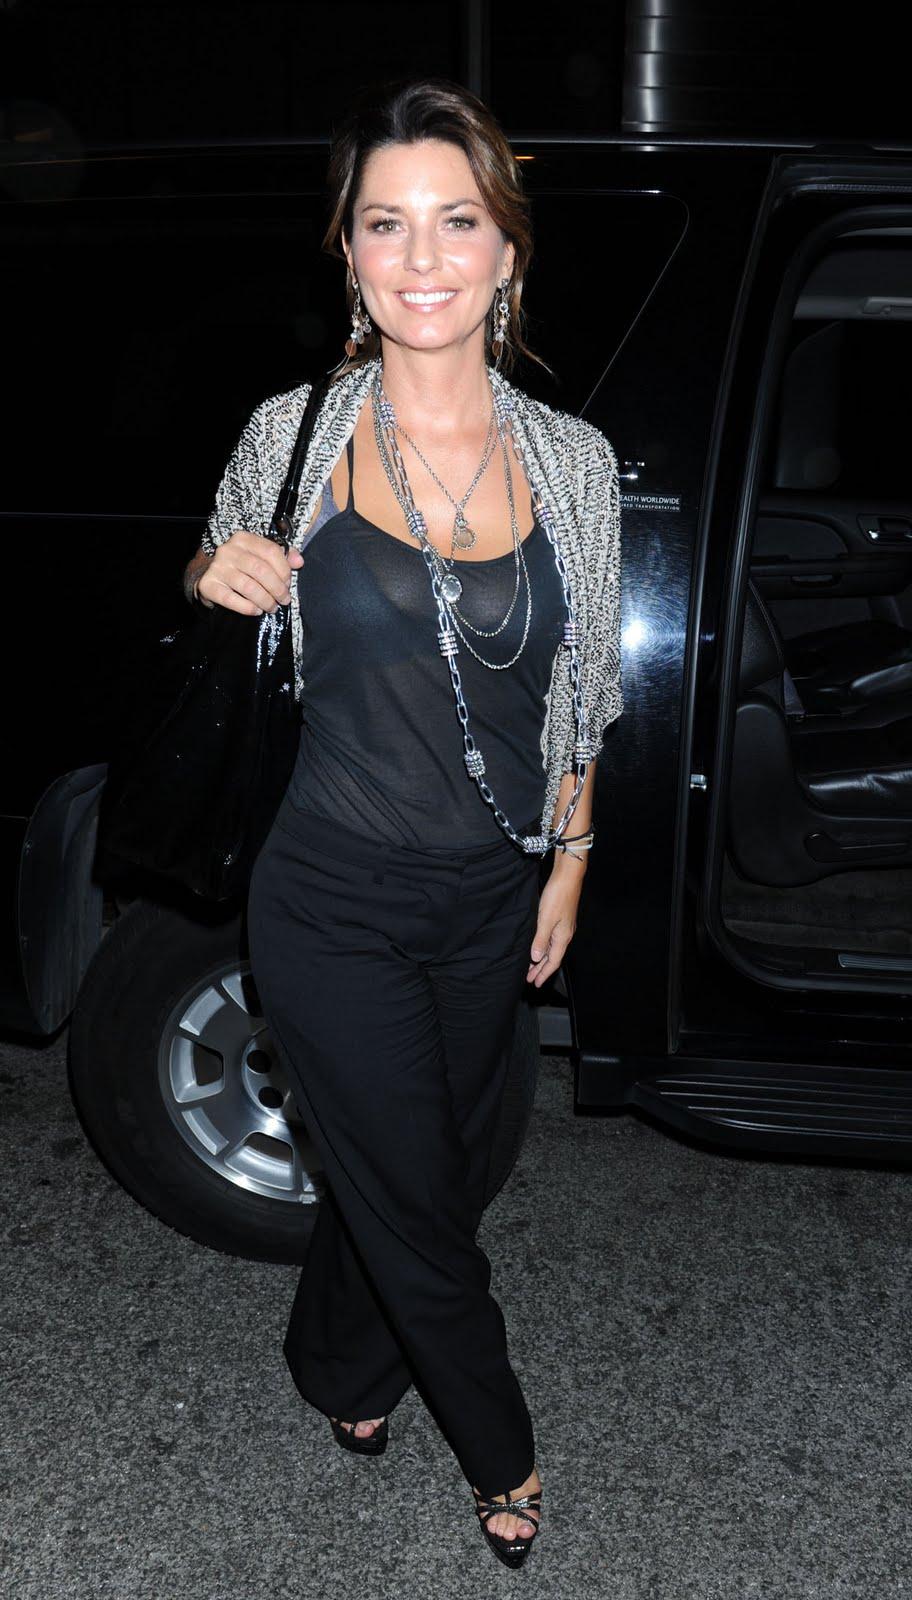 Bikini girl and fashion shania twain shows off her milfy goodness